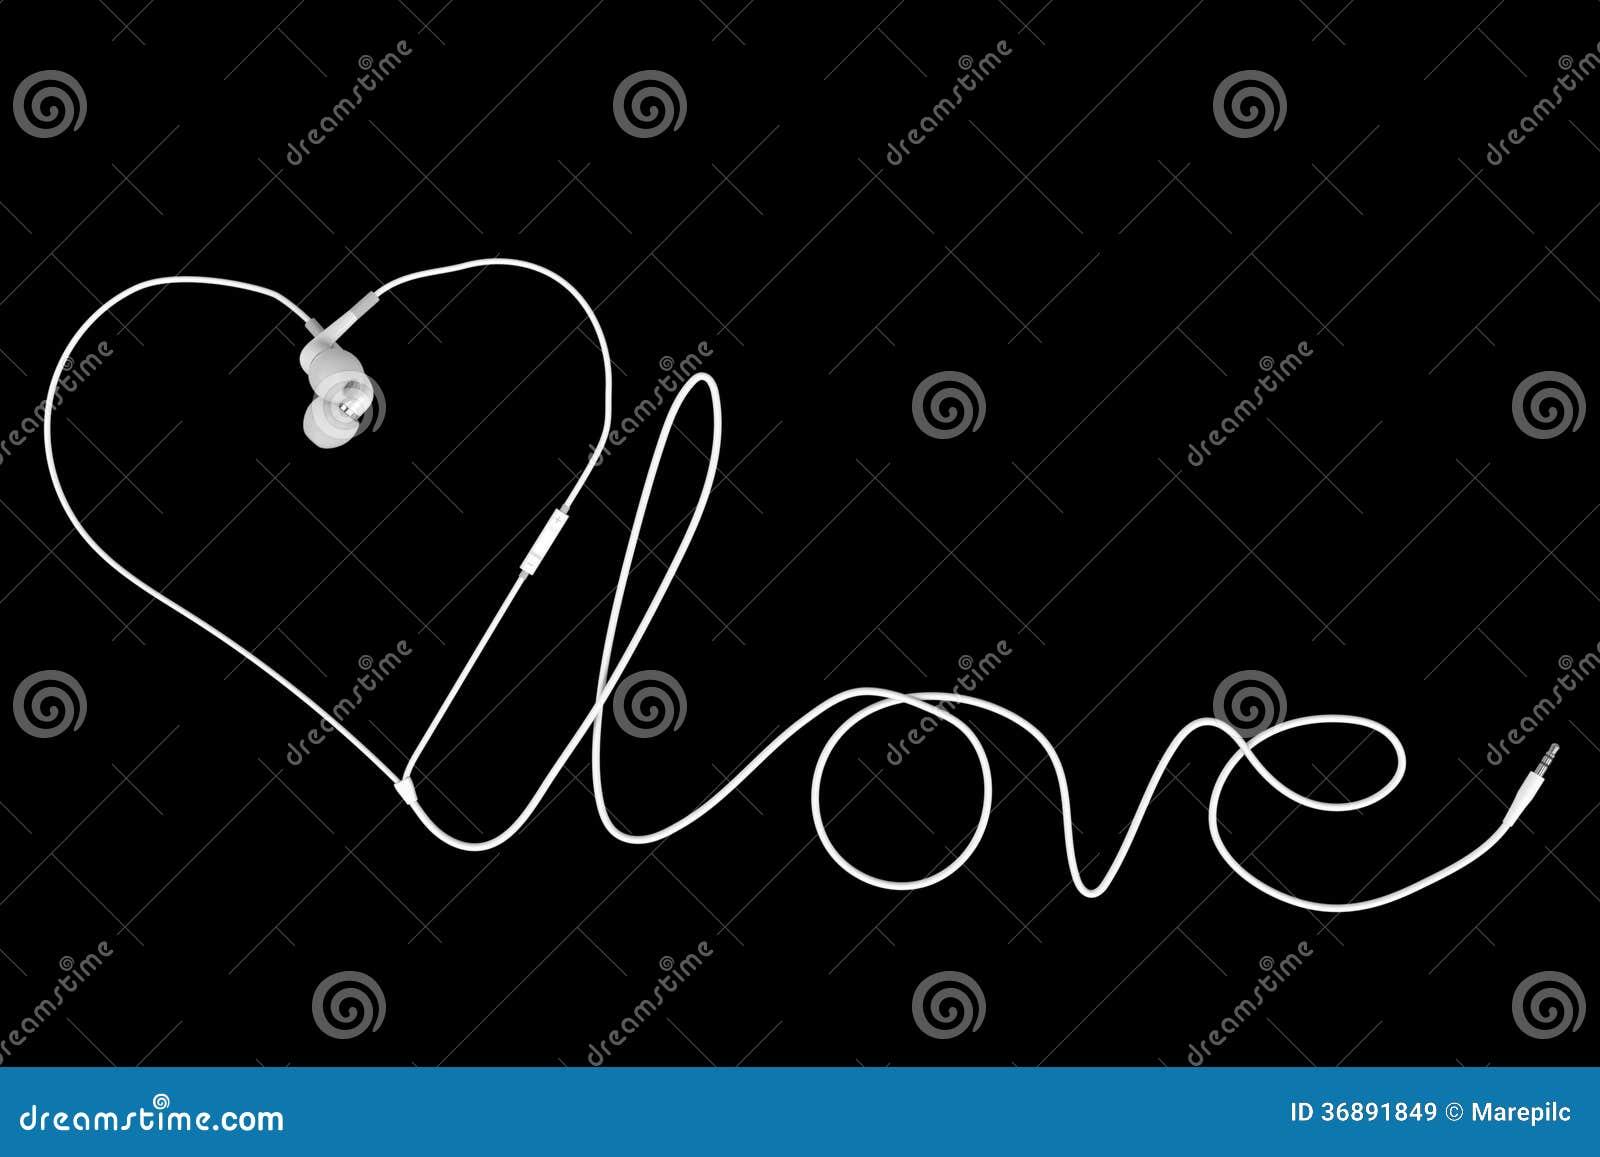 Download Cuffie di amore immagine stock. Immagine di creativo - 36891849